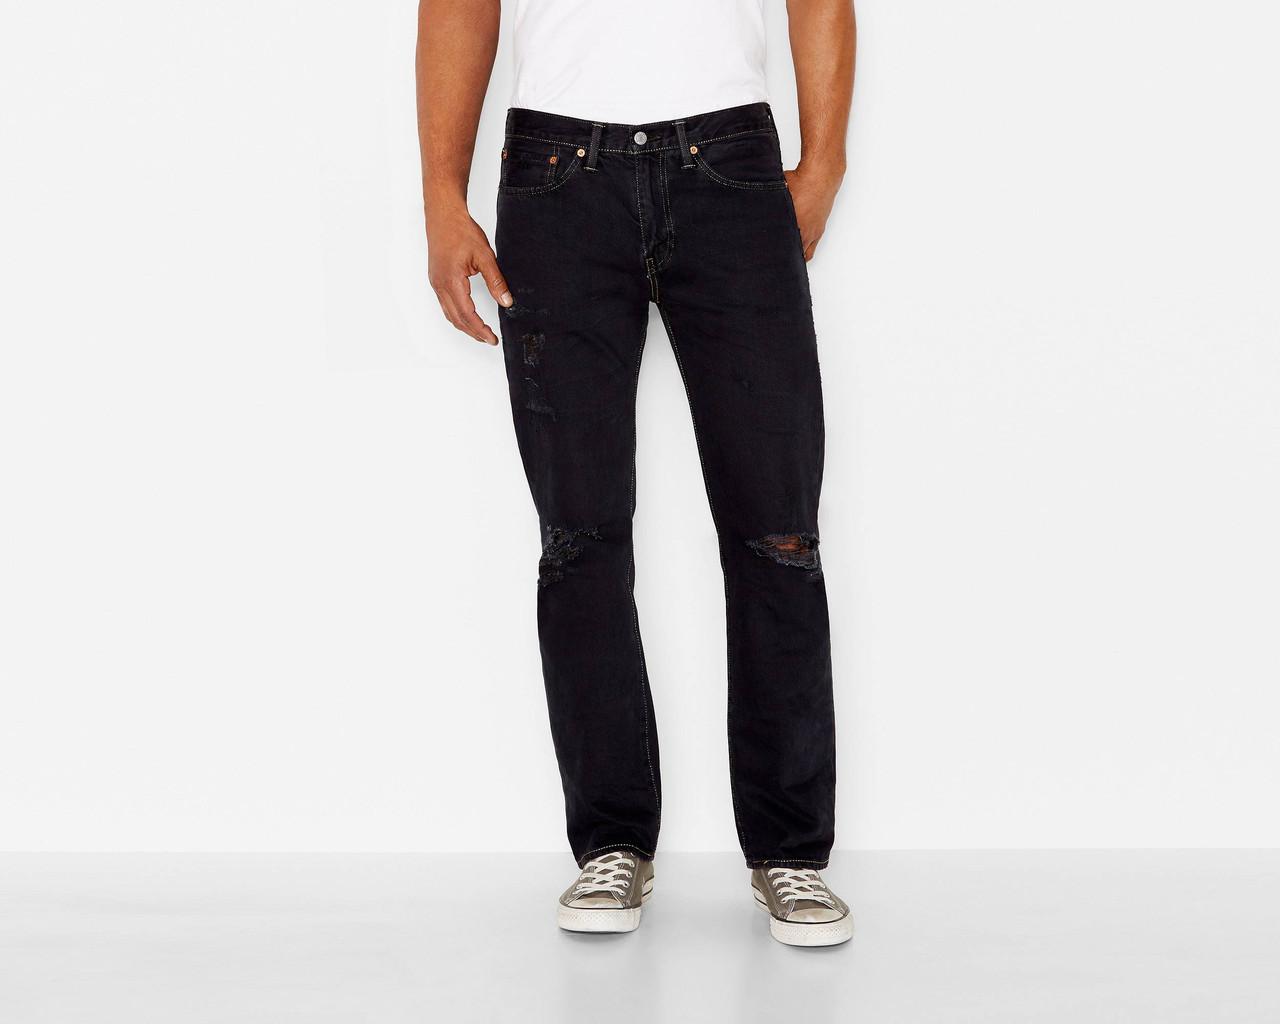 Джинсы Levi's 514 Straight Fit, Black Dell, 34W30L, 005140759